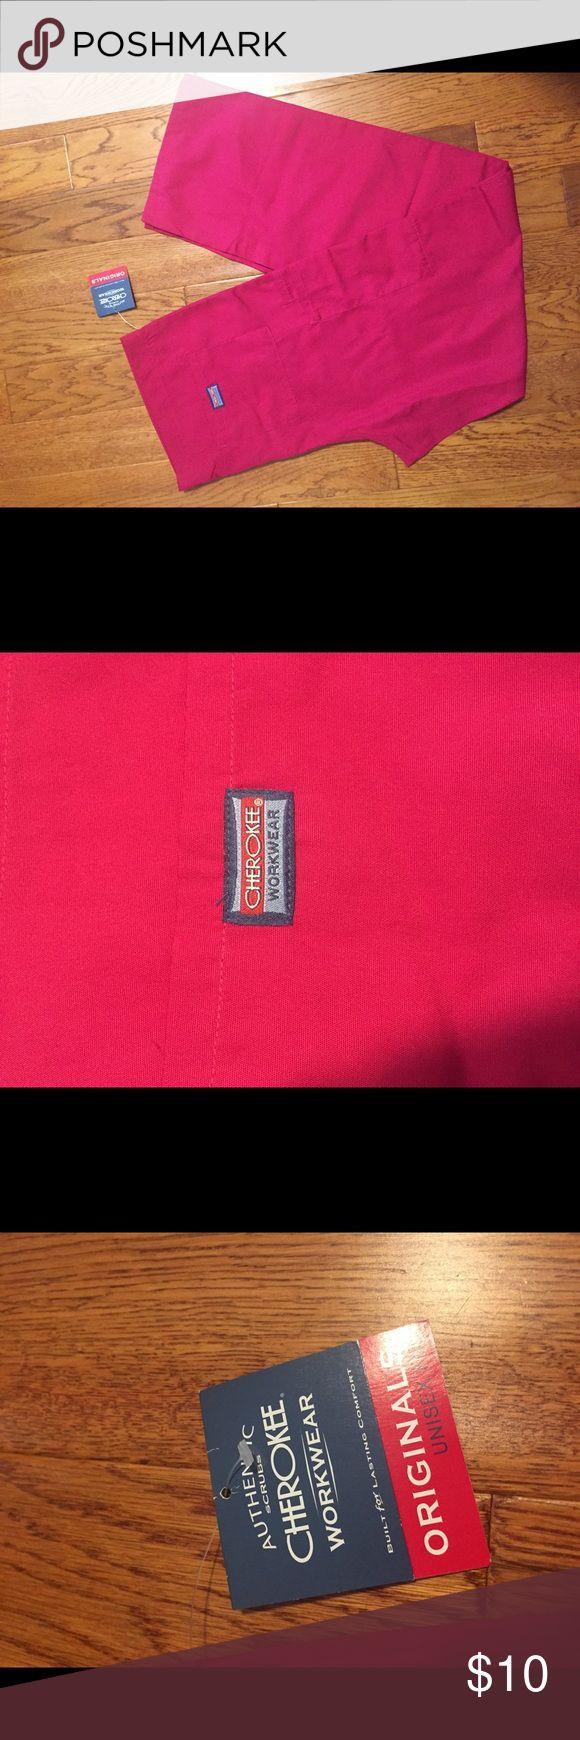 NWT Cherokee pink work wear scrubs Pants Tall M Brand new with tags  Pink scrubs Cherokee brand Tall medium size Cherokee Pants